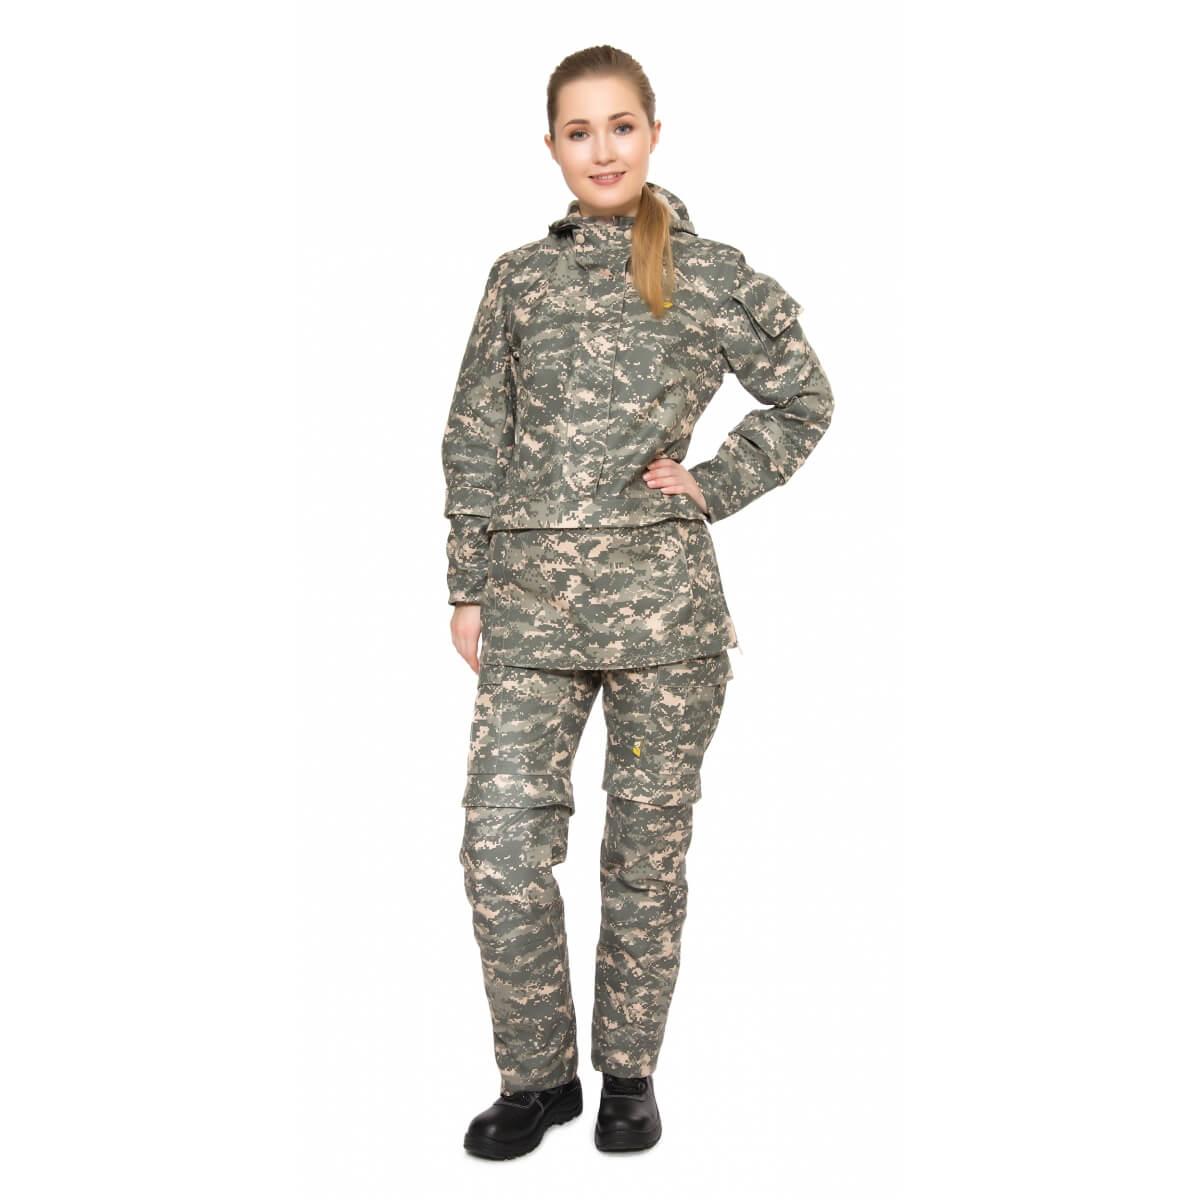 Женский противоэнцефалитный костюм Биостоп® Оптимум